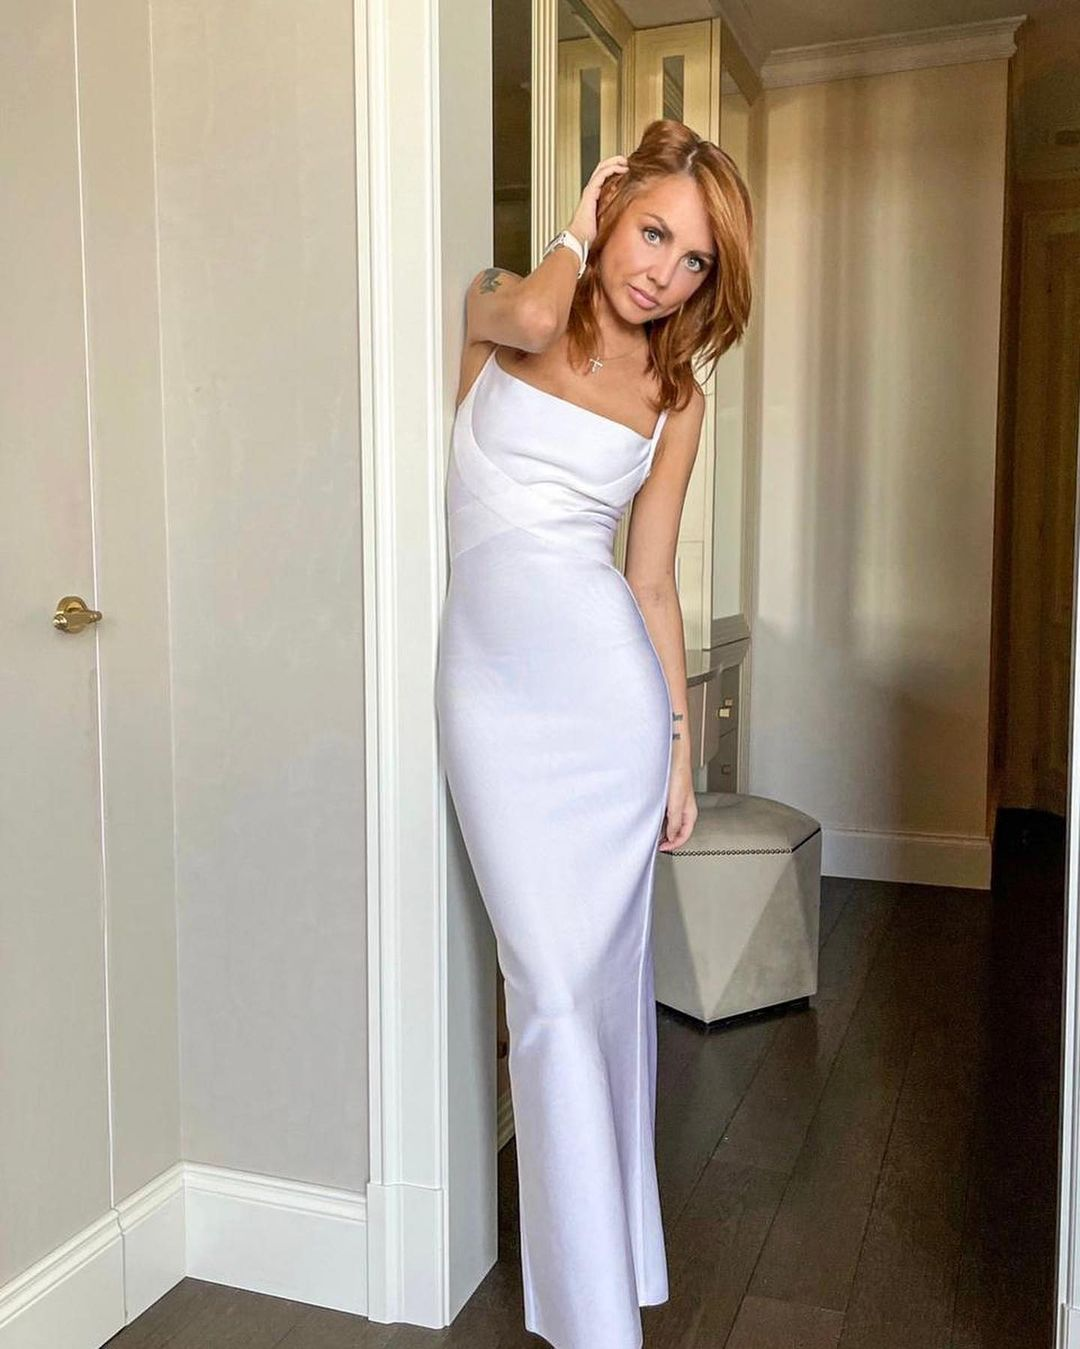 Singer MakSim arranged a photo shoot in a white dress, highlighting her thinness